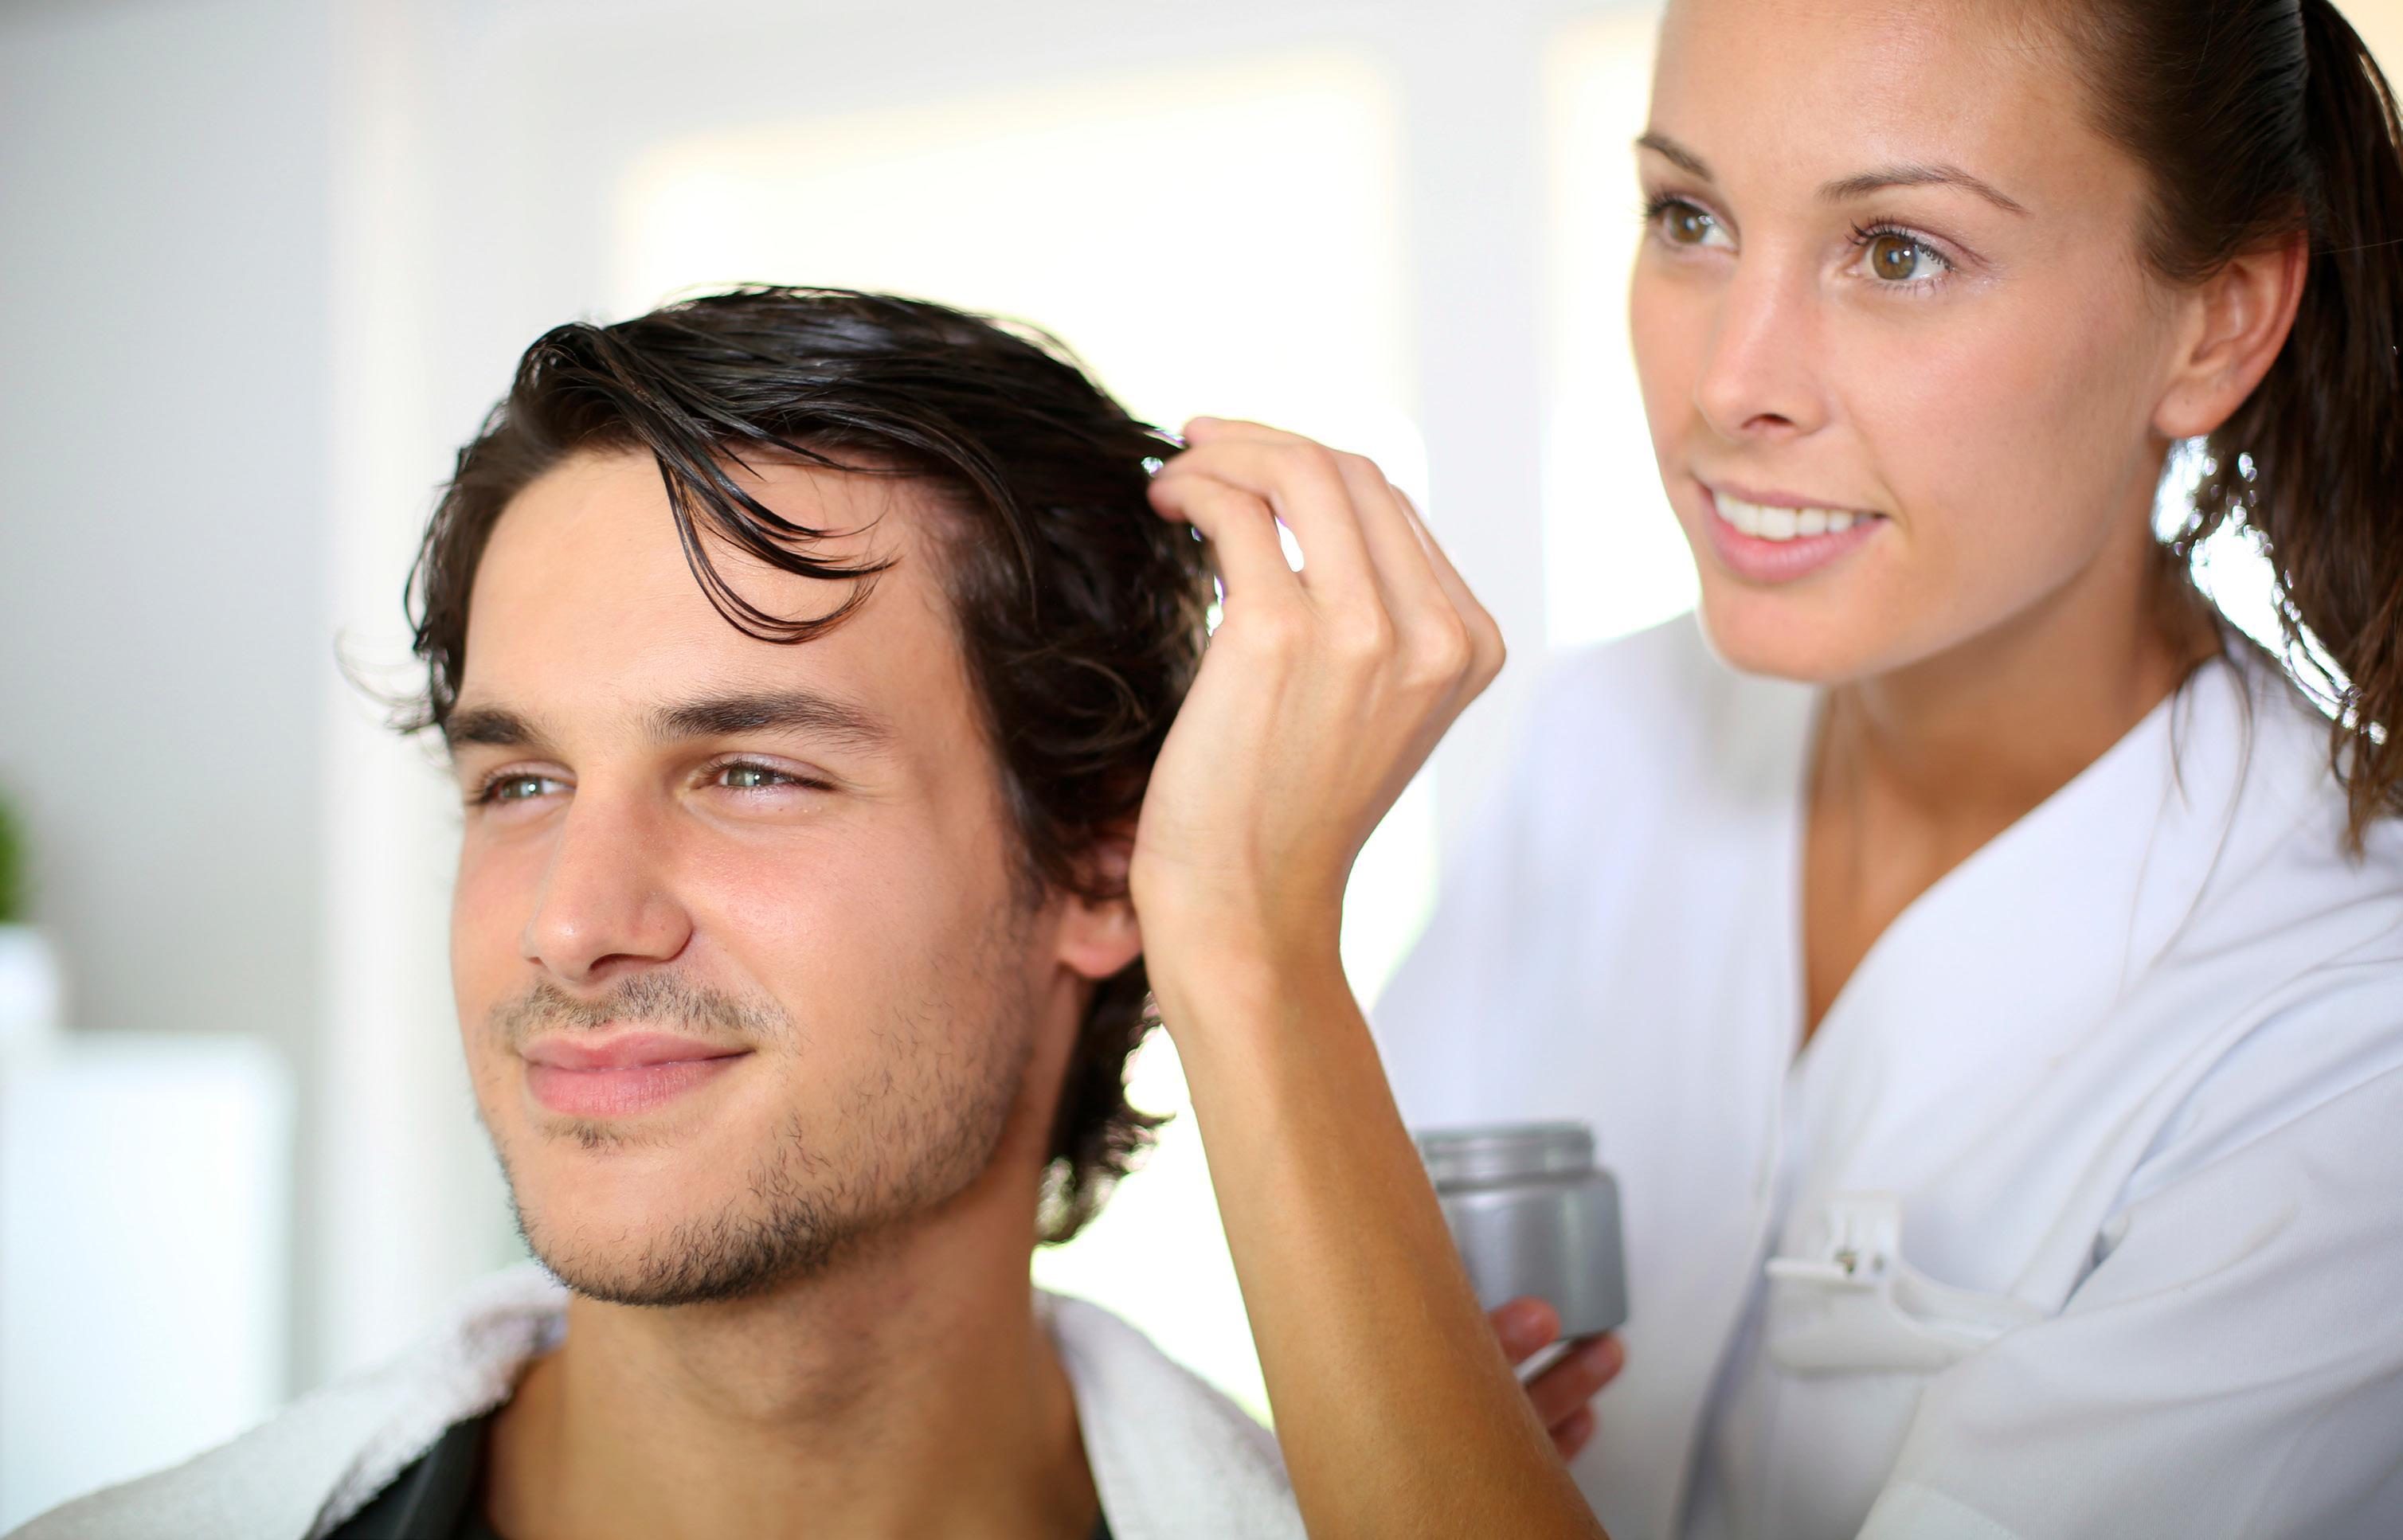 hair-styling-product-Hair-Wax